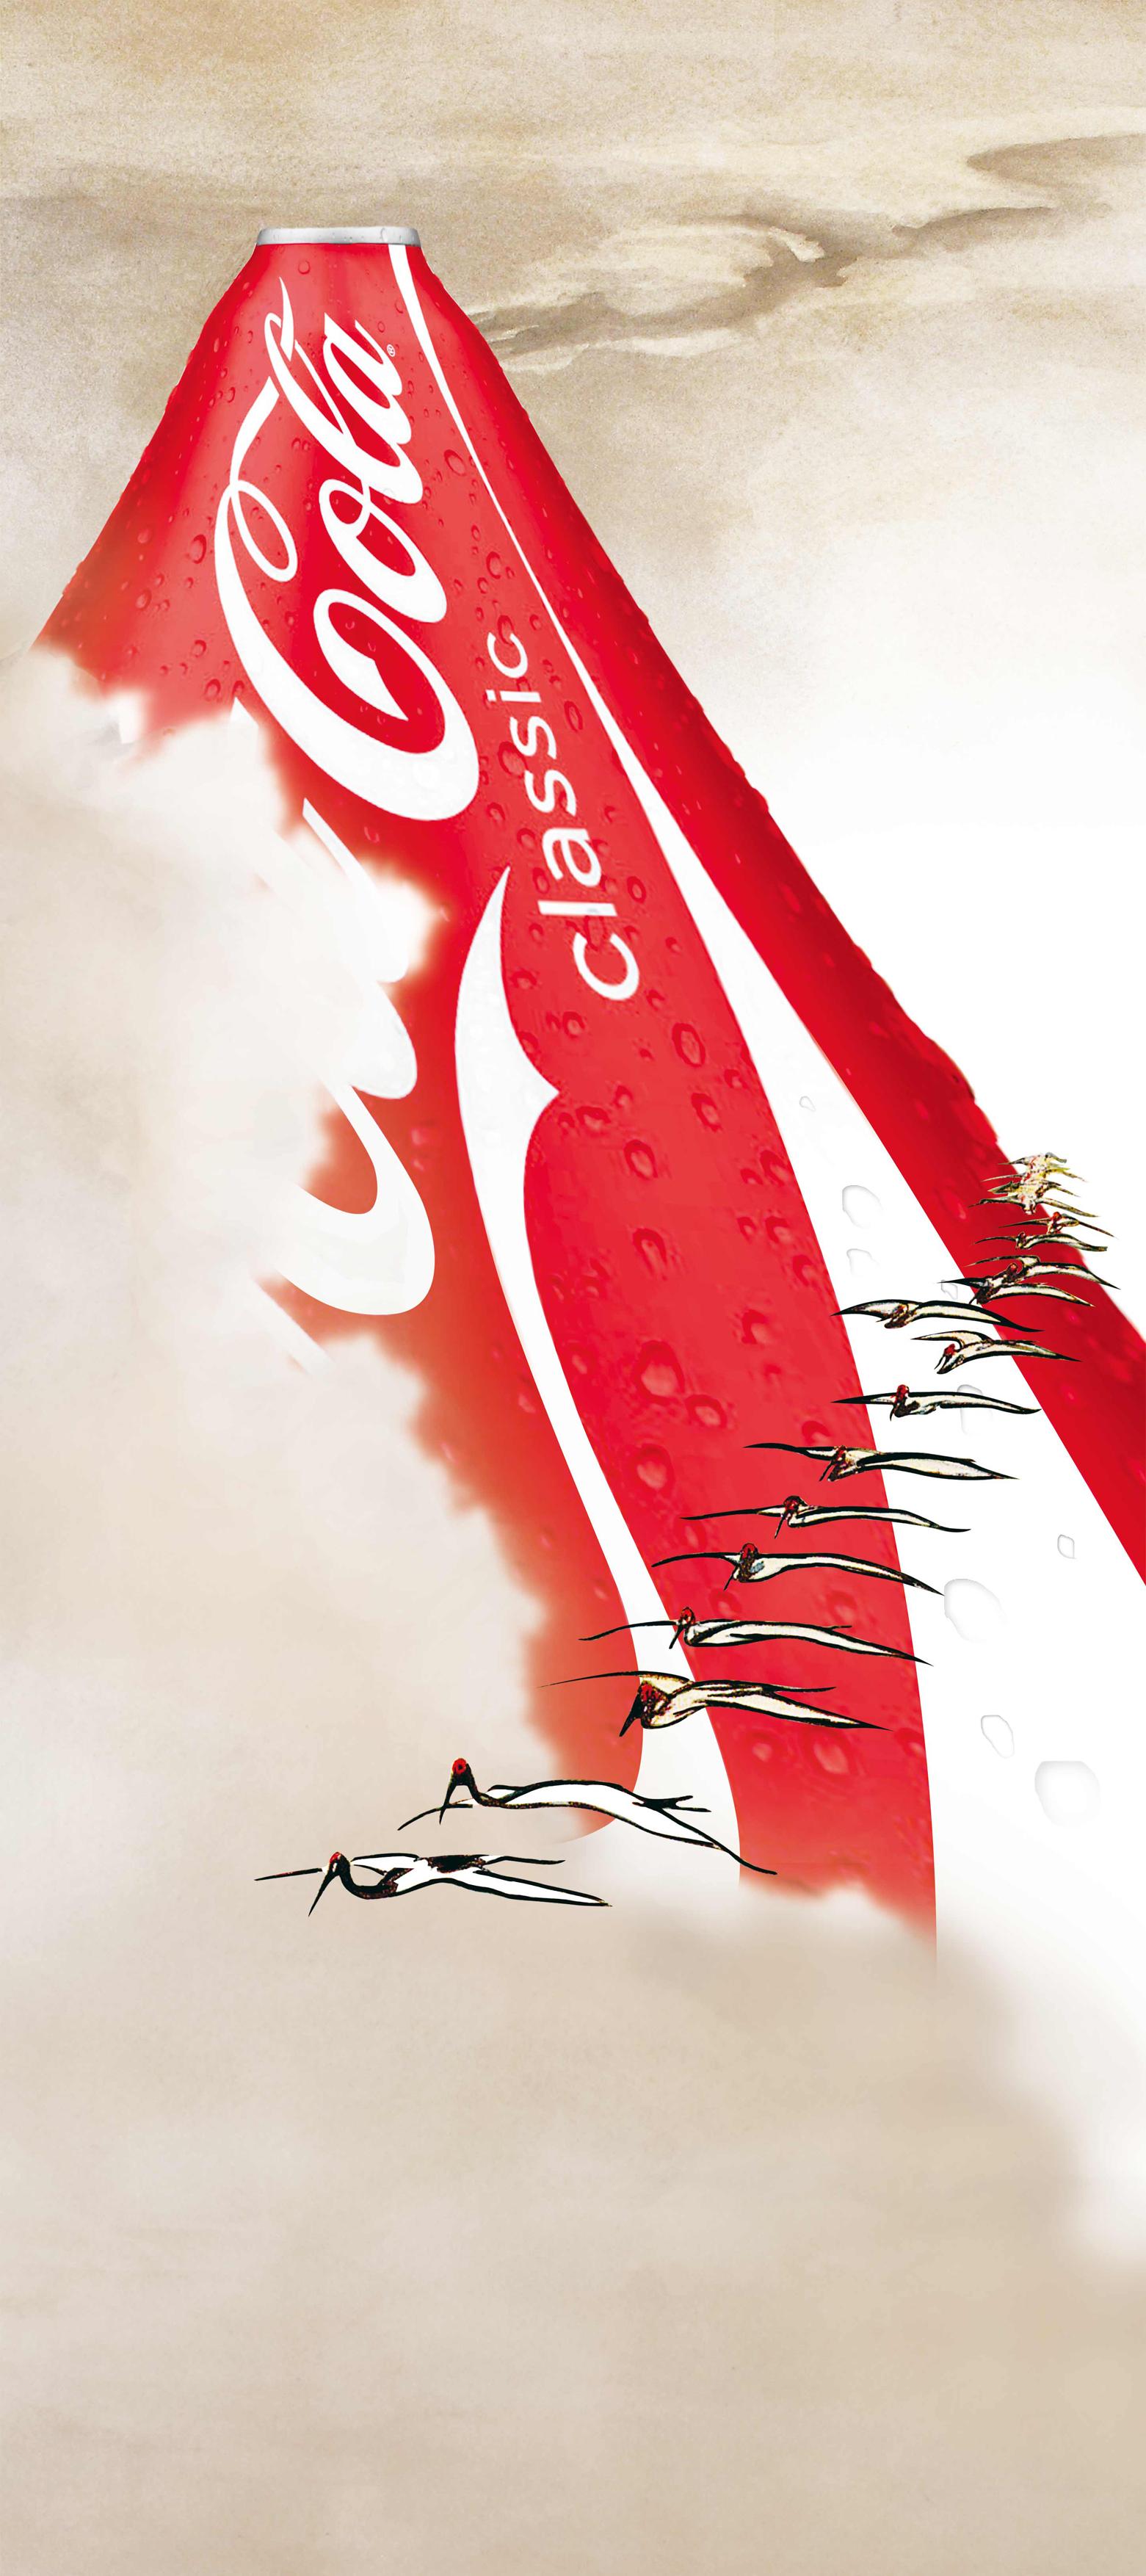 Alex Adam Gallery_Peter MacMillan(Seisai)_Coke fuji_2012_Mixed media_(W) 58cm (H) 78cm_$1080